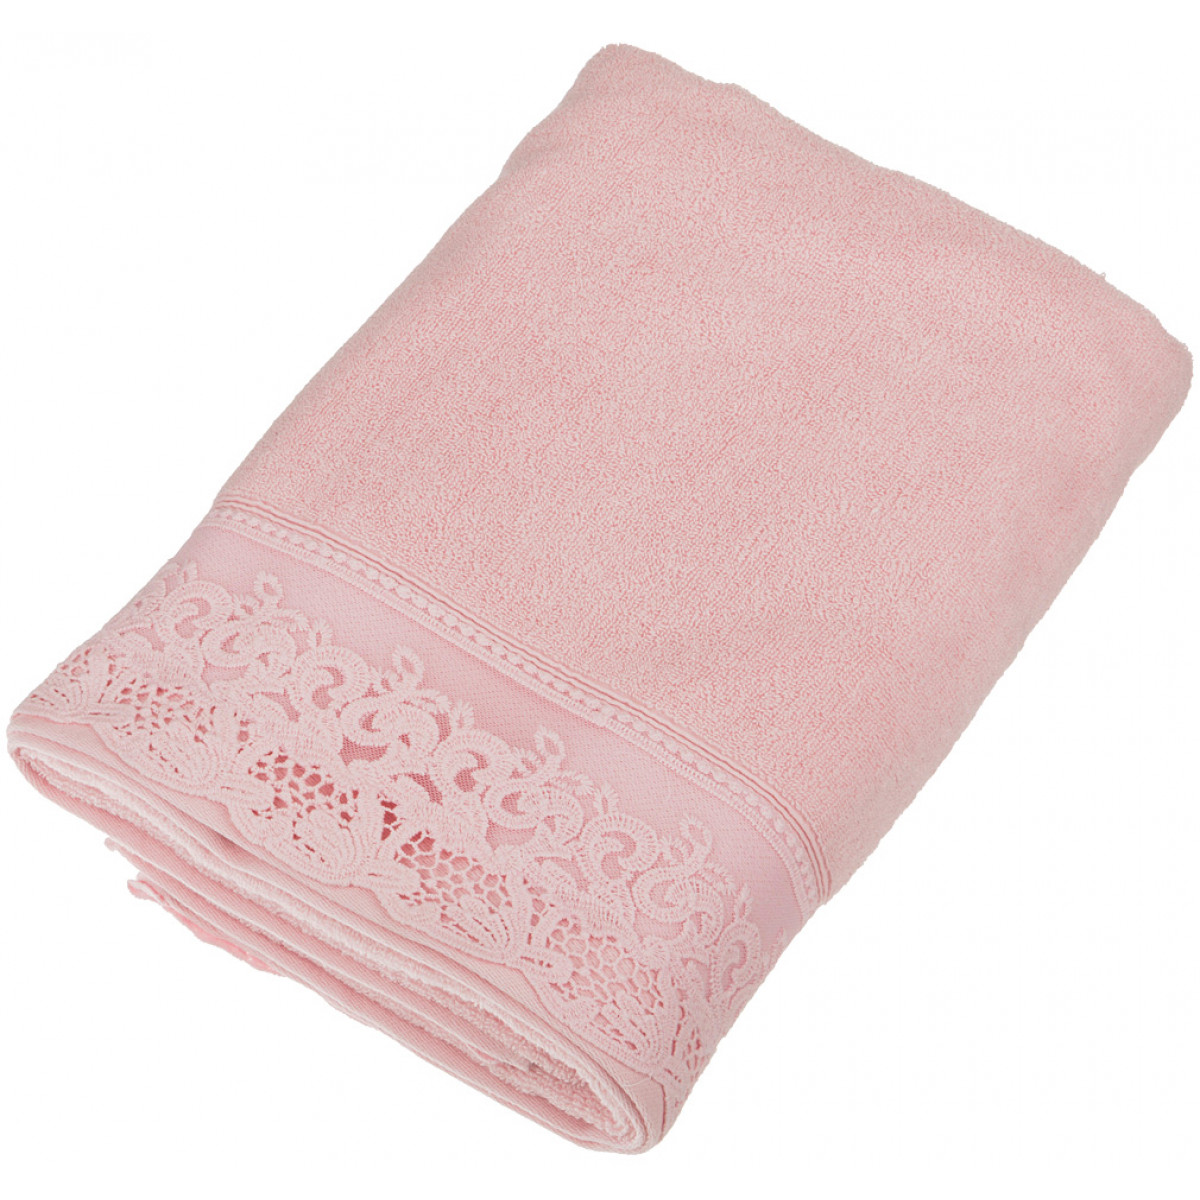 Полотенца Santalino Полотенце Terra  (50х90 см) полотенце денастия полотенце денастия 50х90 см хлопок